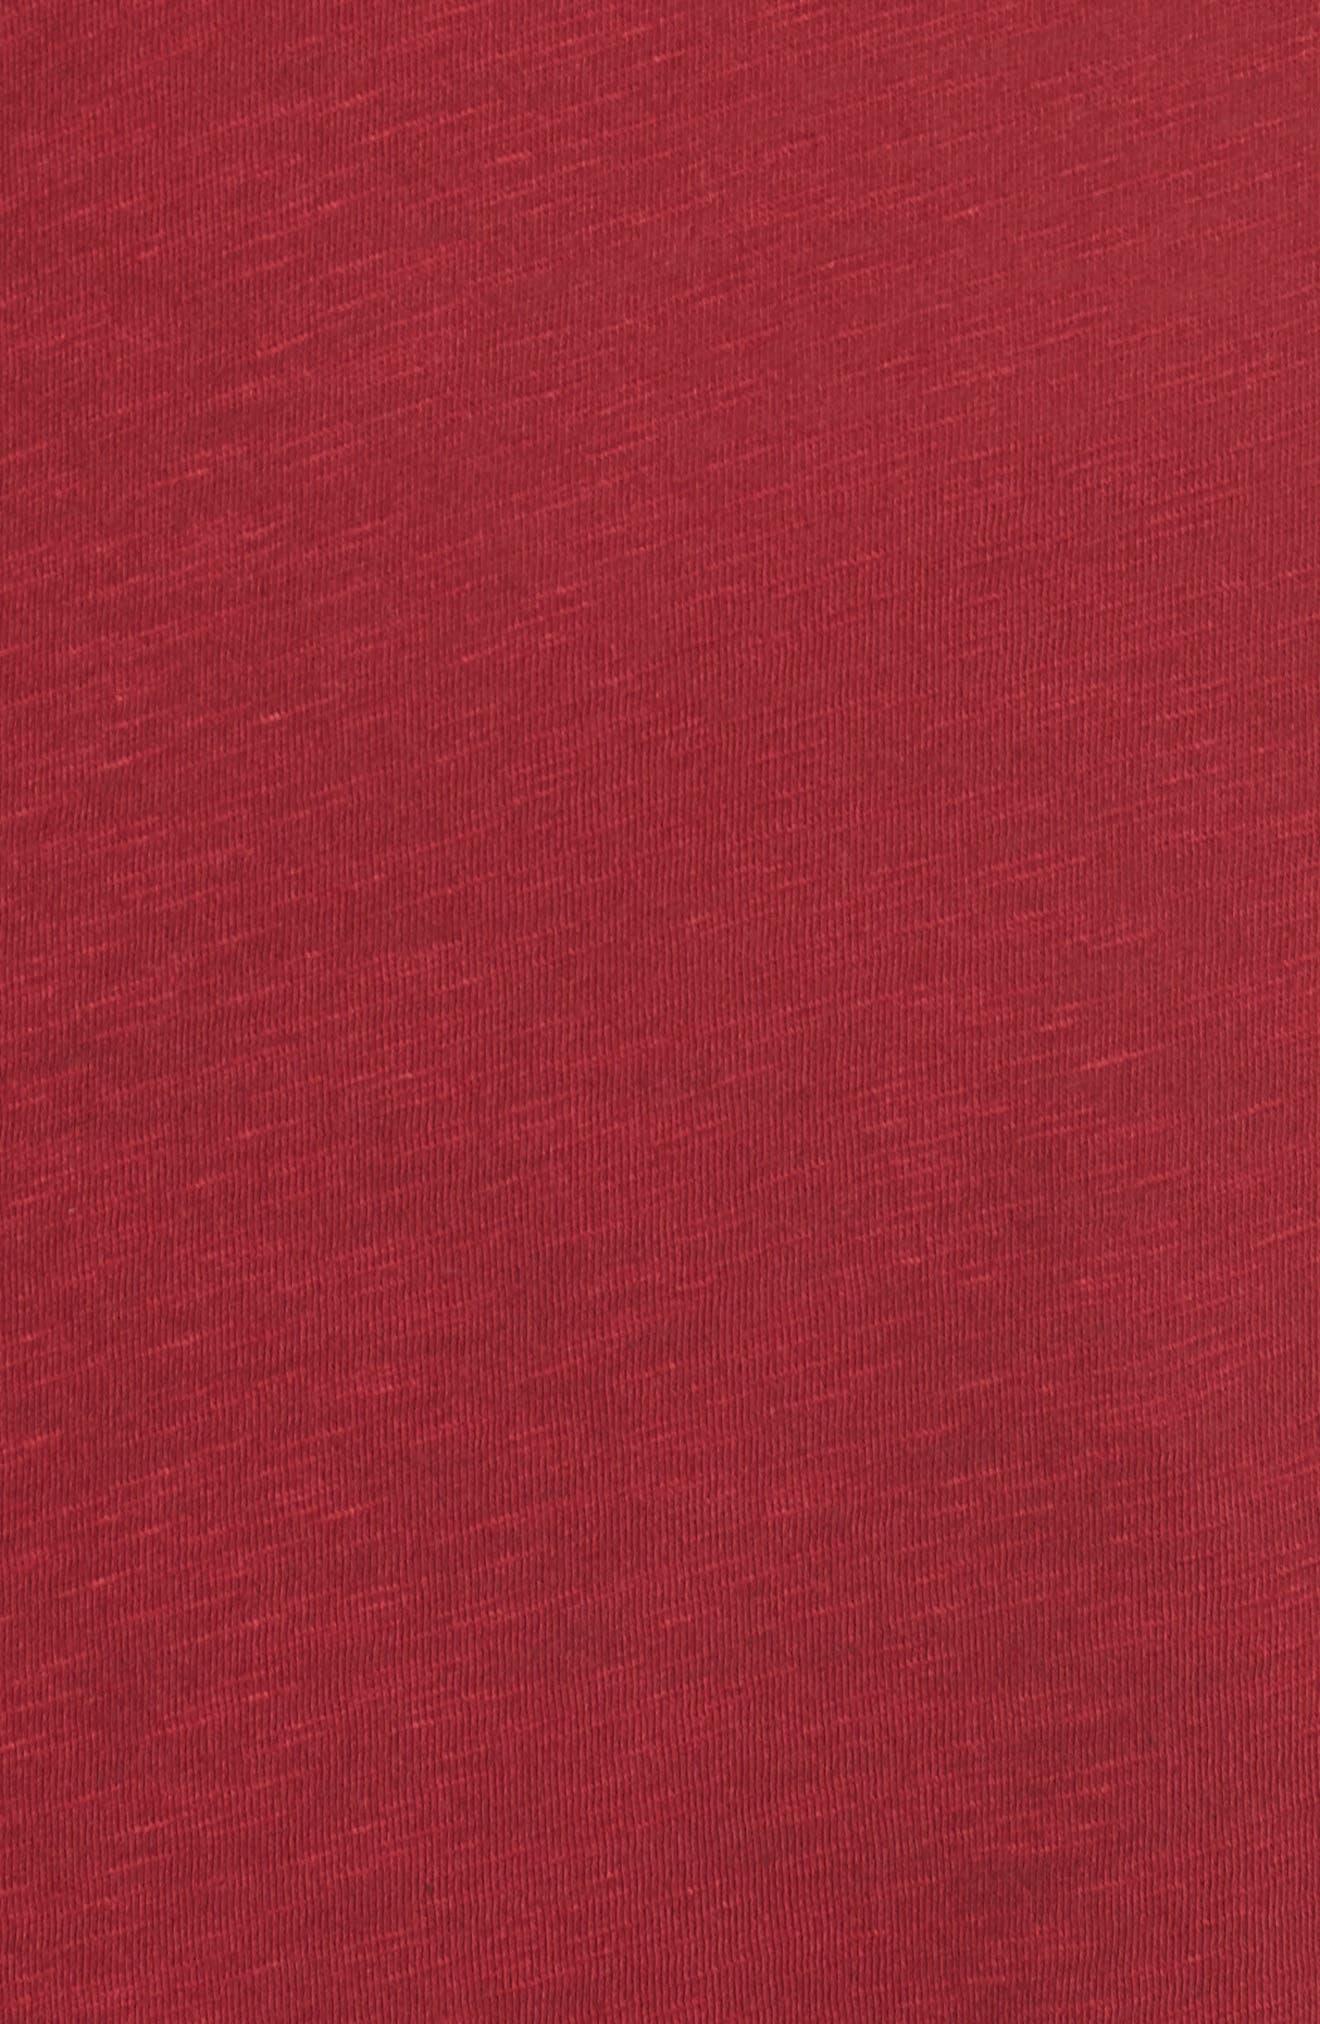 Long Sleeve Crewneck Tee,                             Alternate thumbnail 12, color,                             Red Rumba